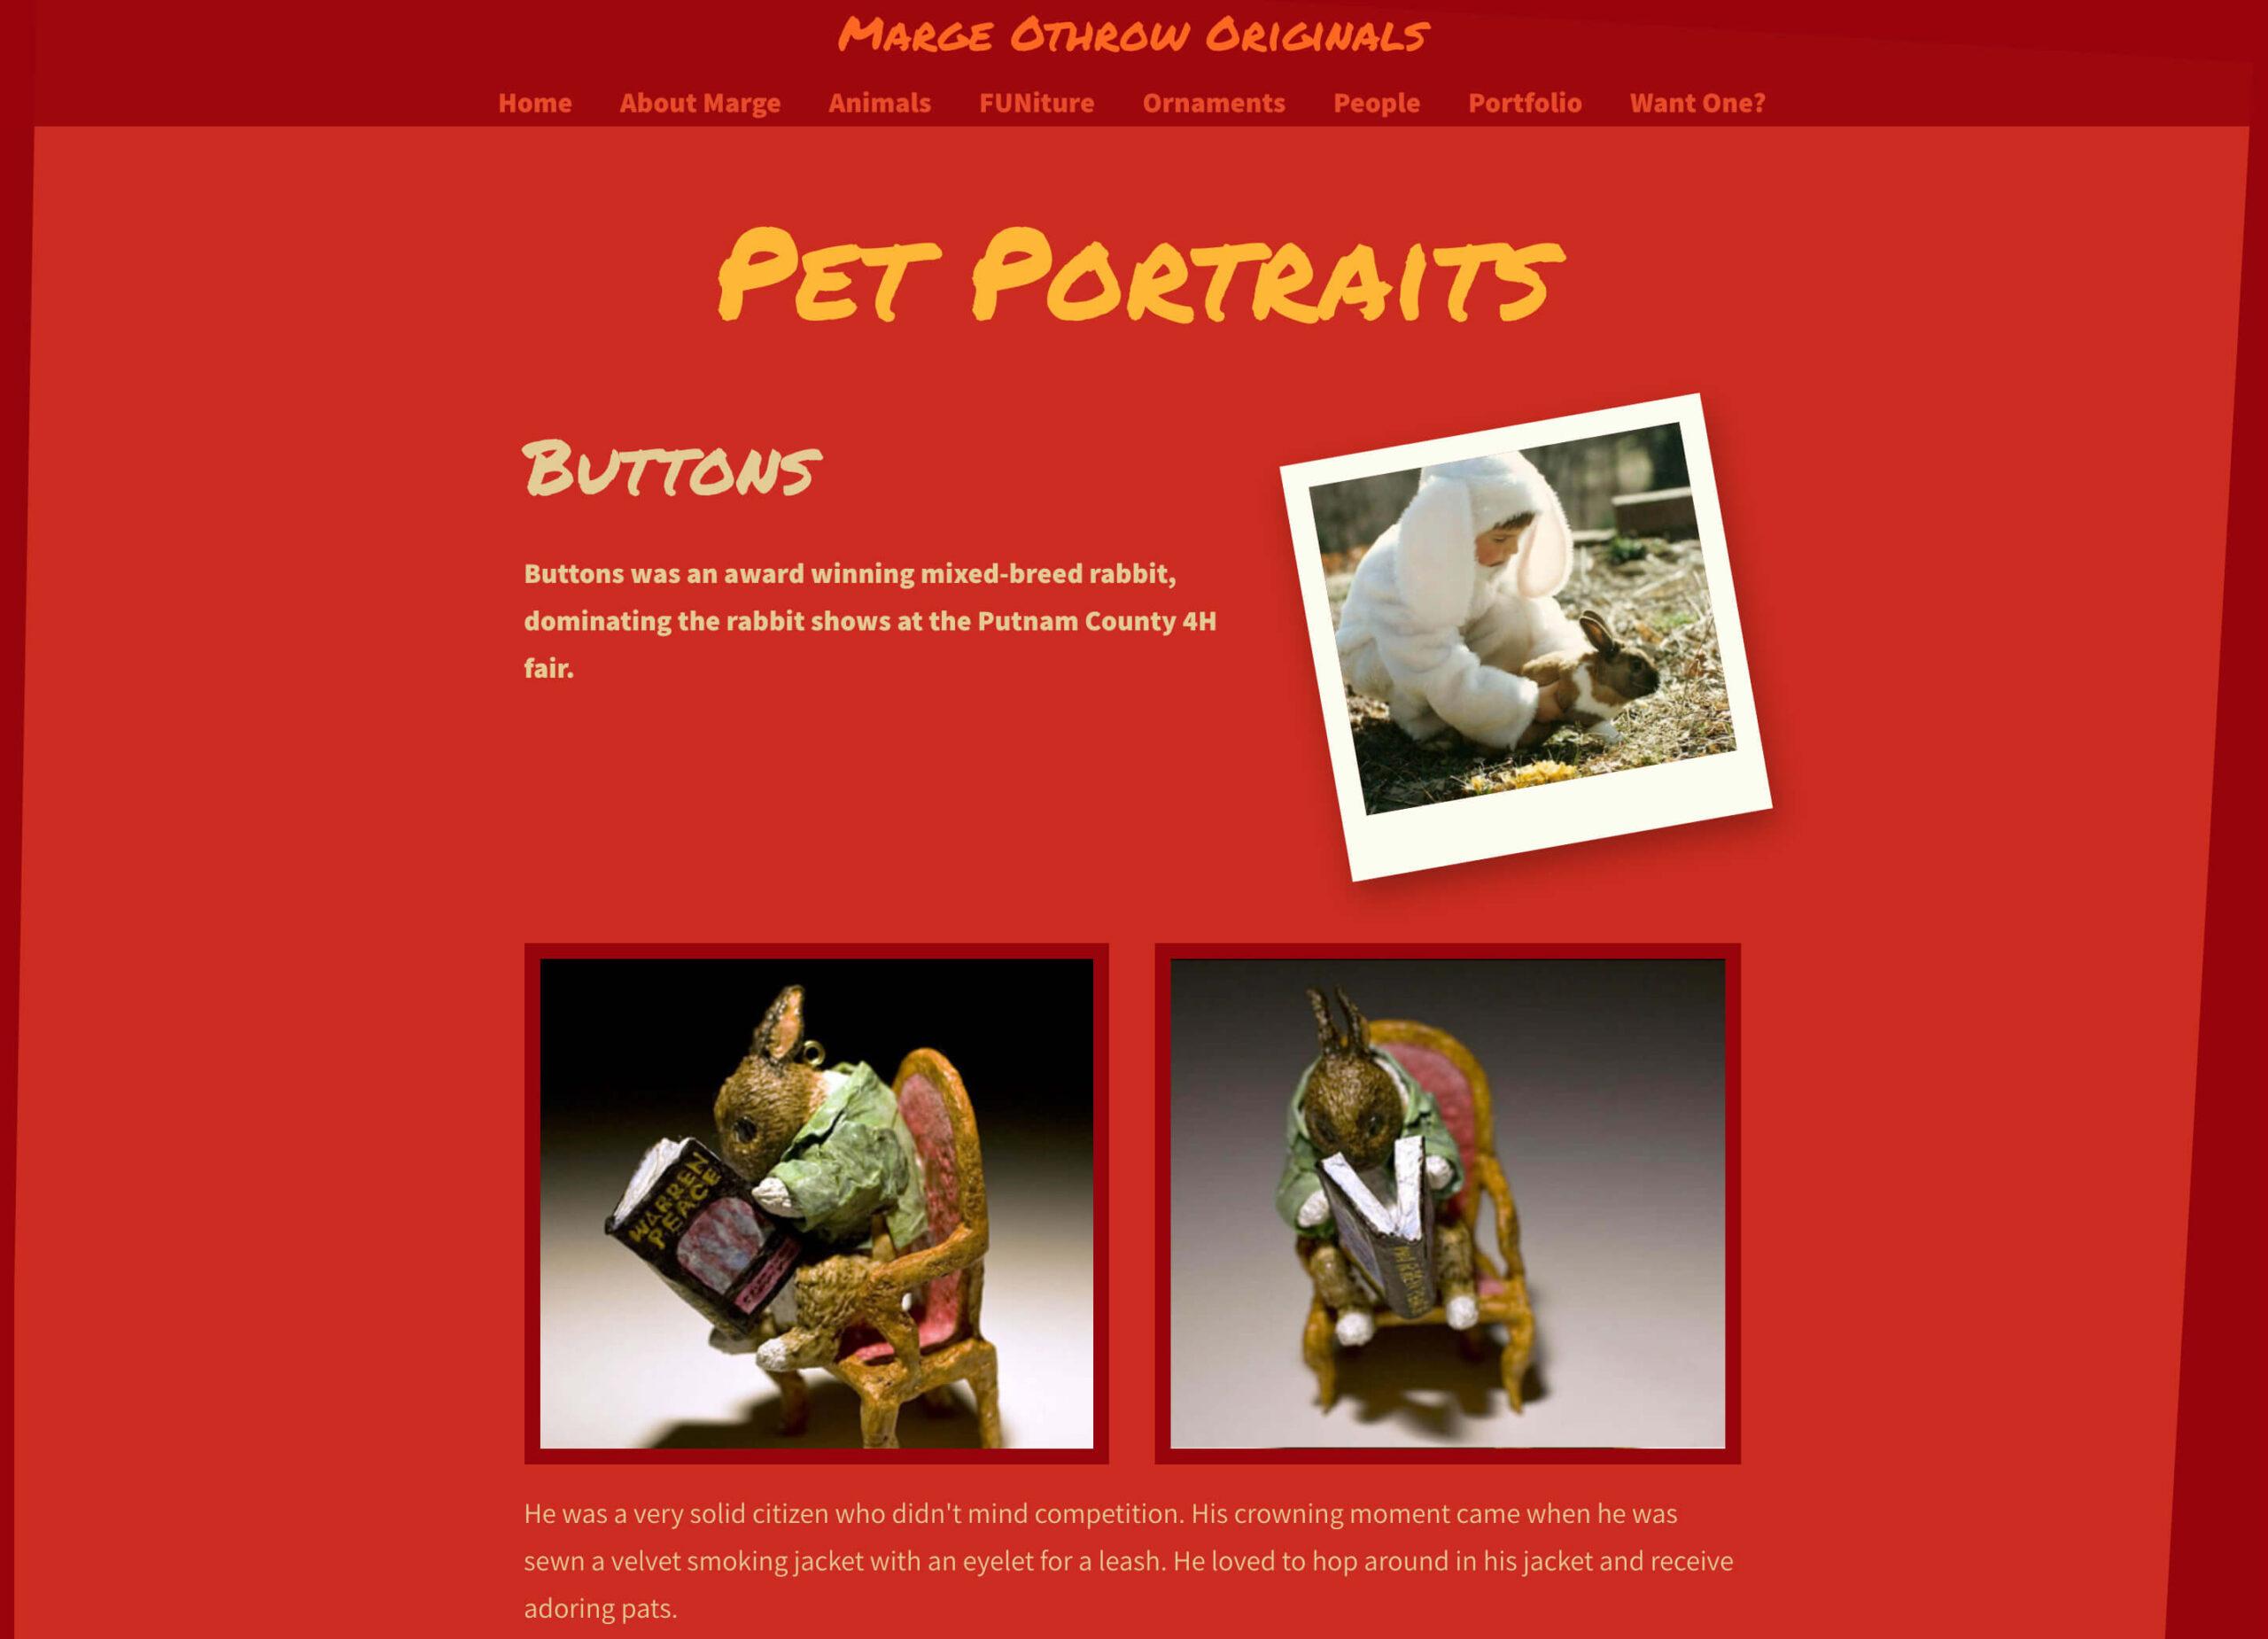 Marge Othrow - Pet Portraits